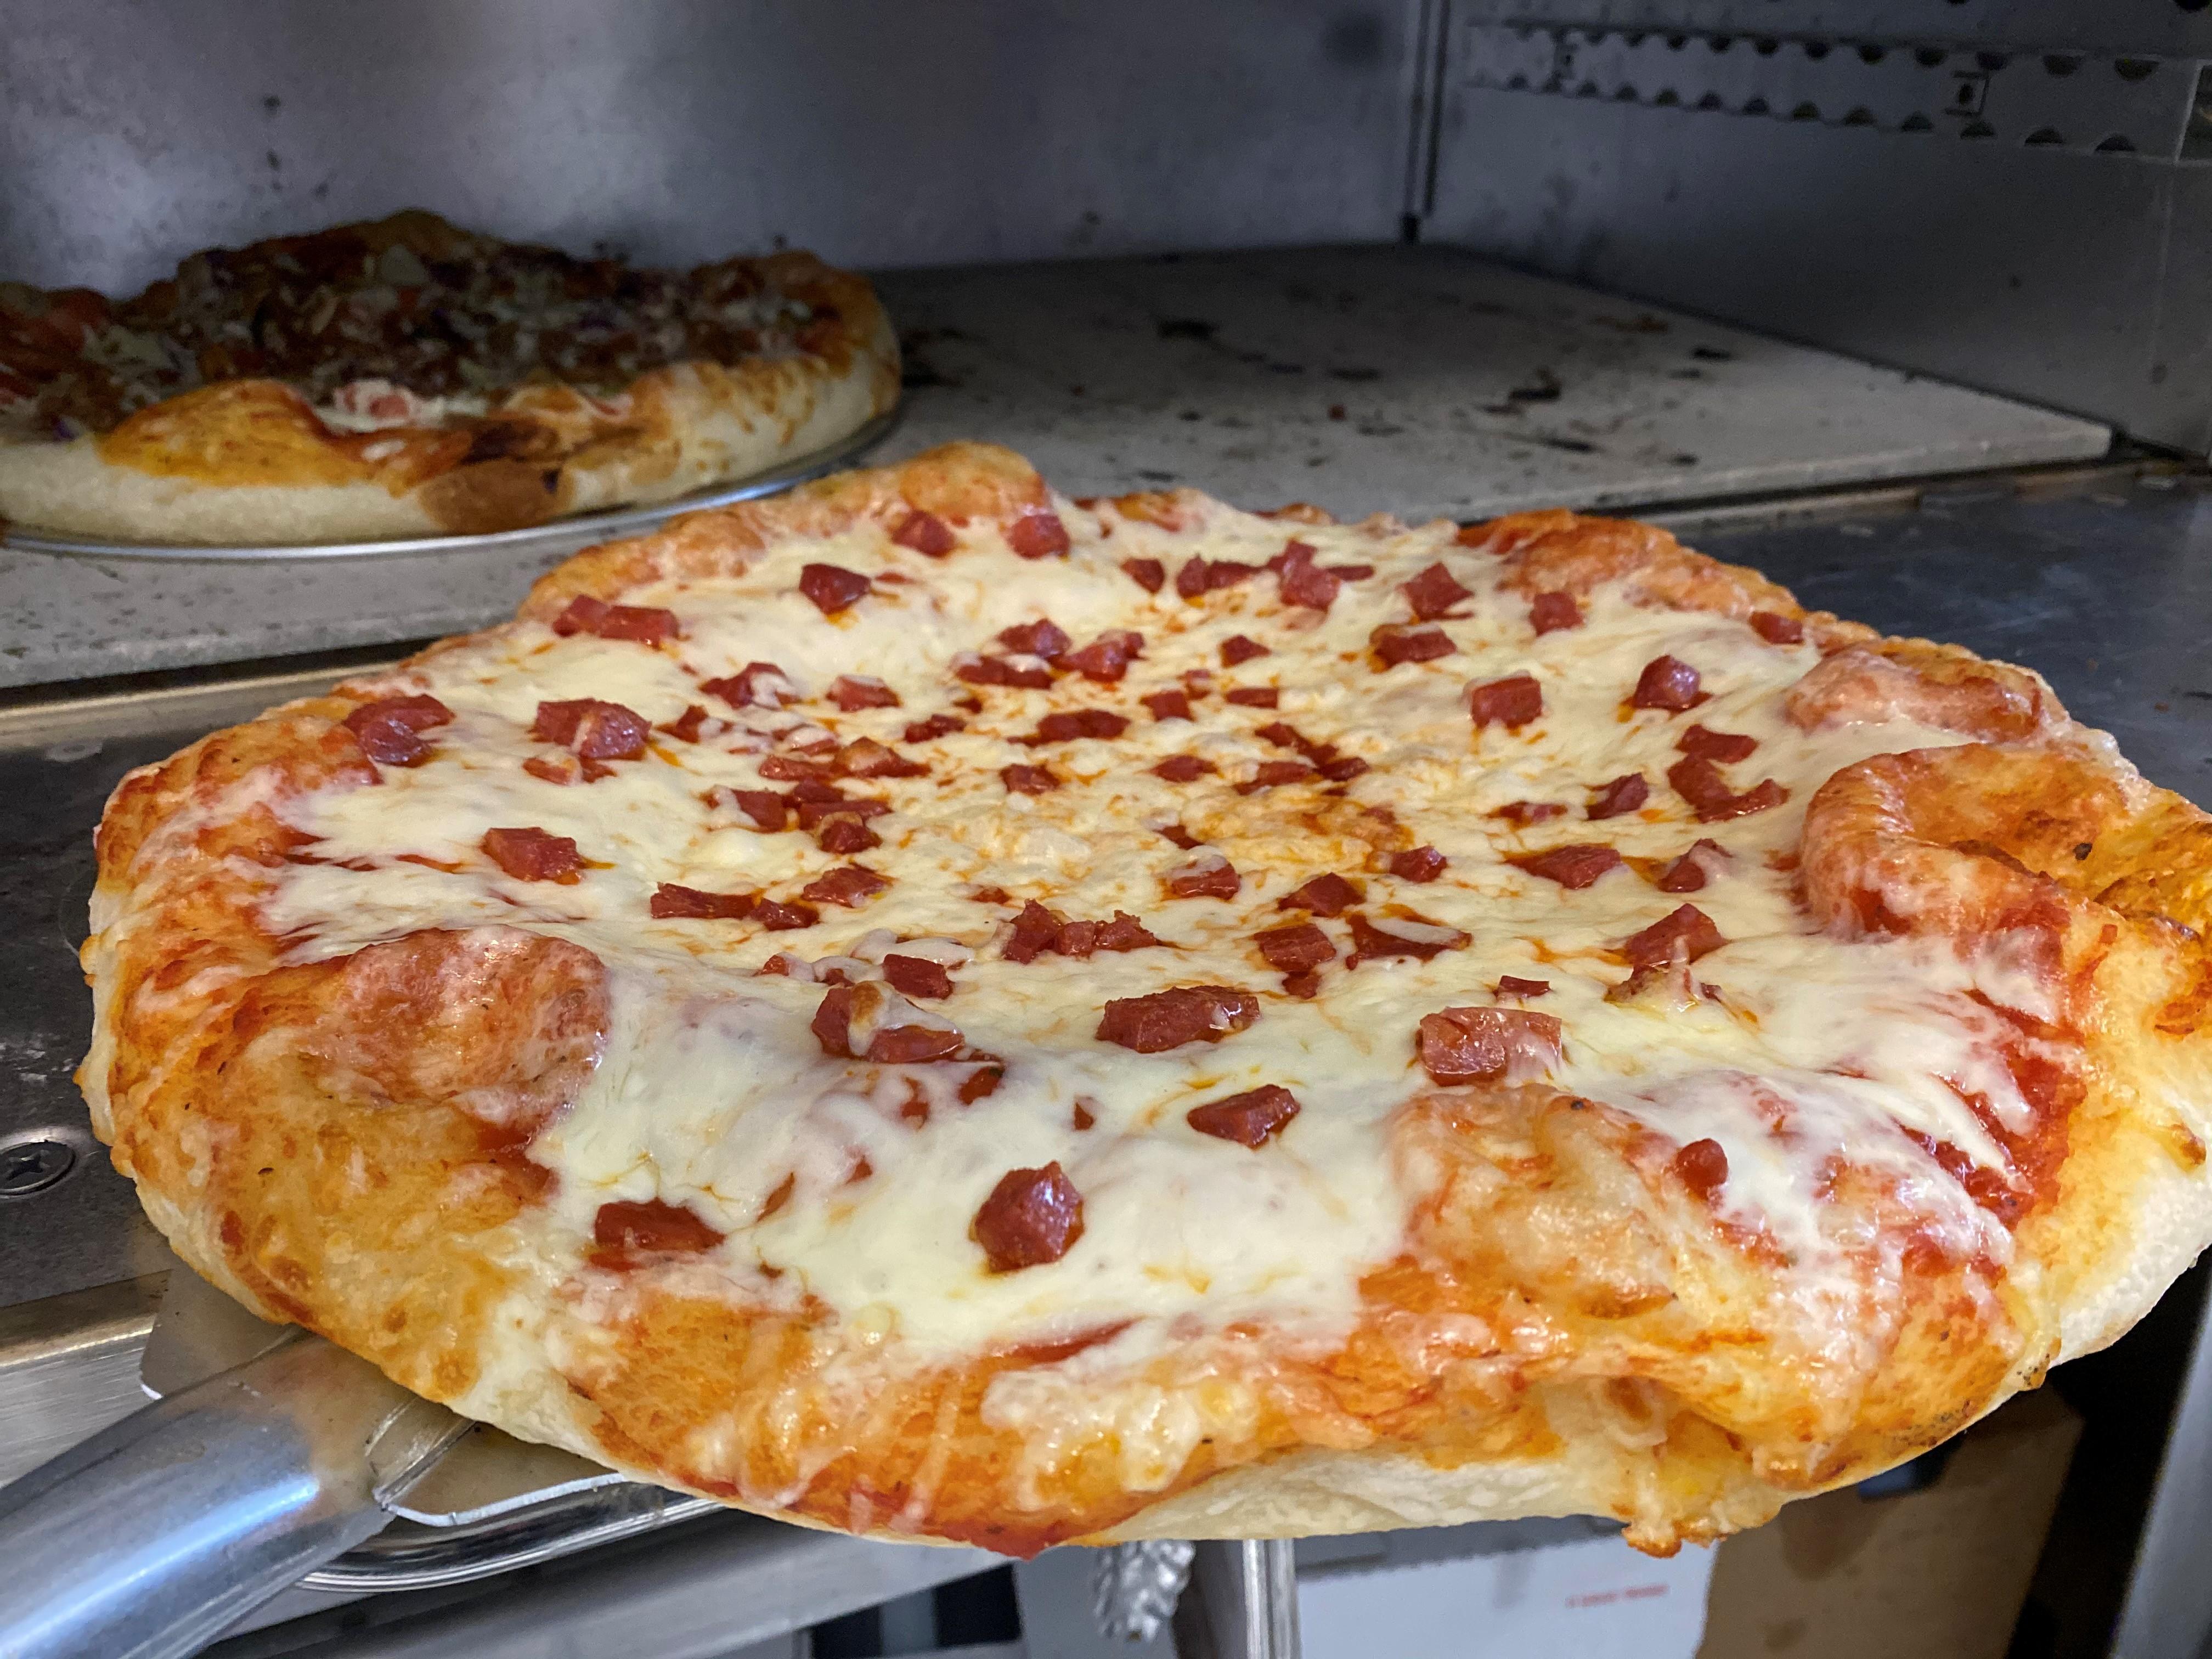 spicy geneoa salami pizza